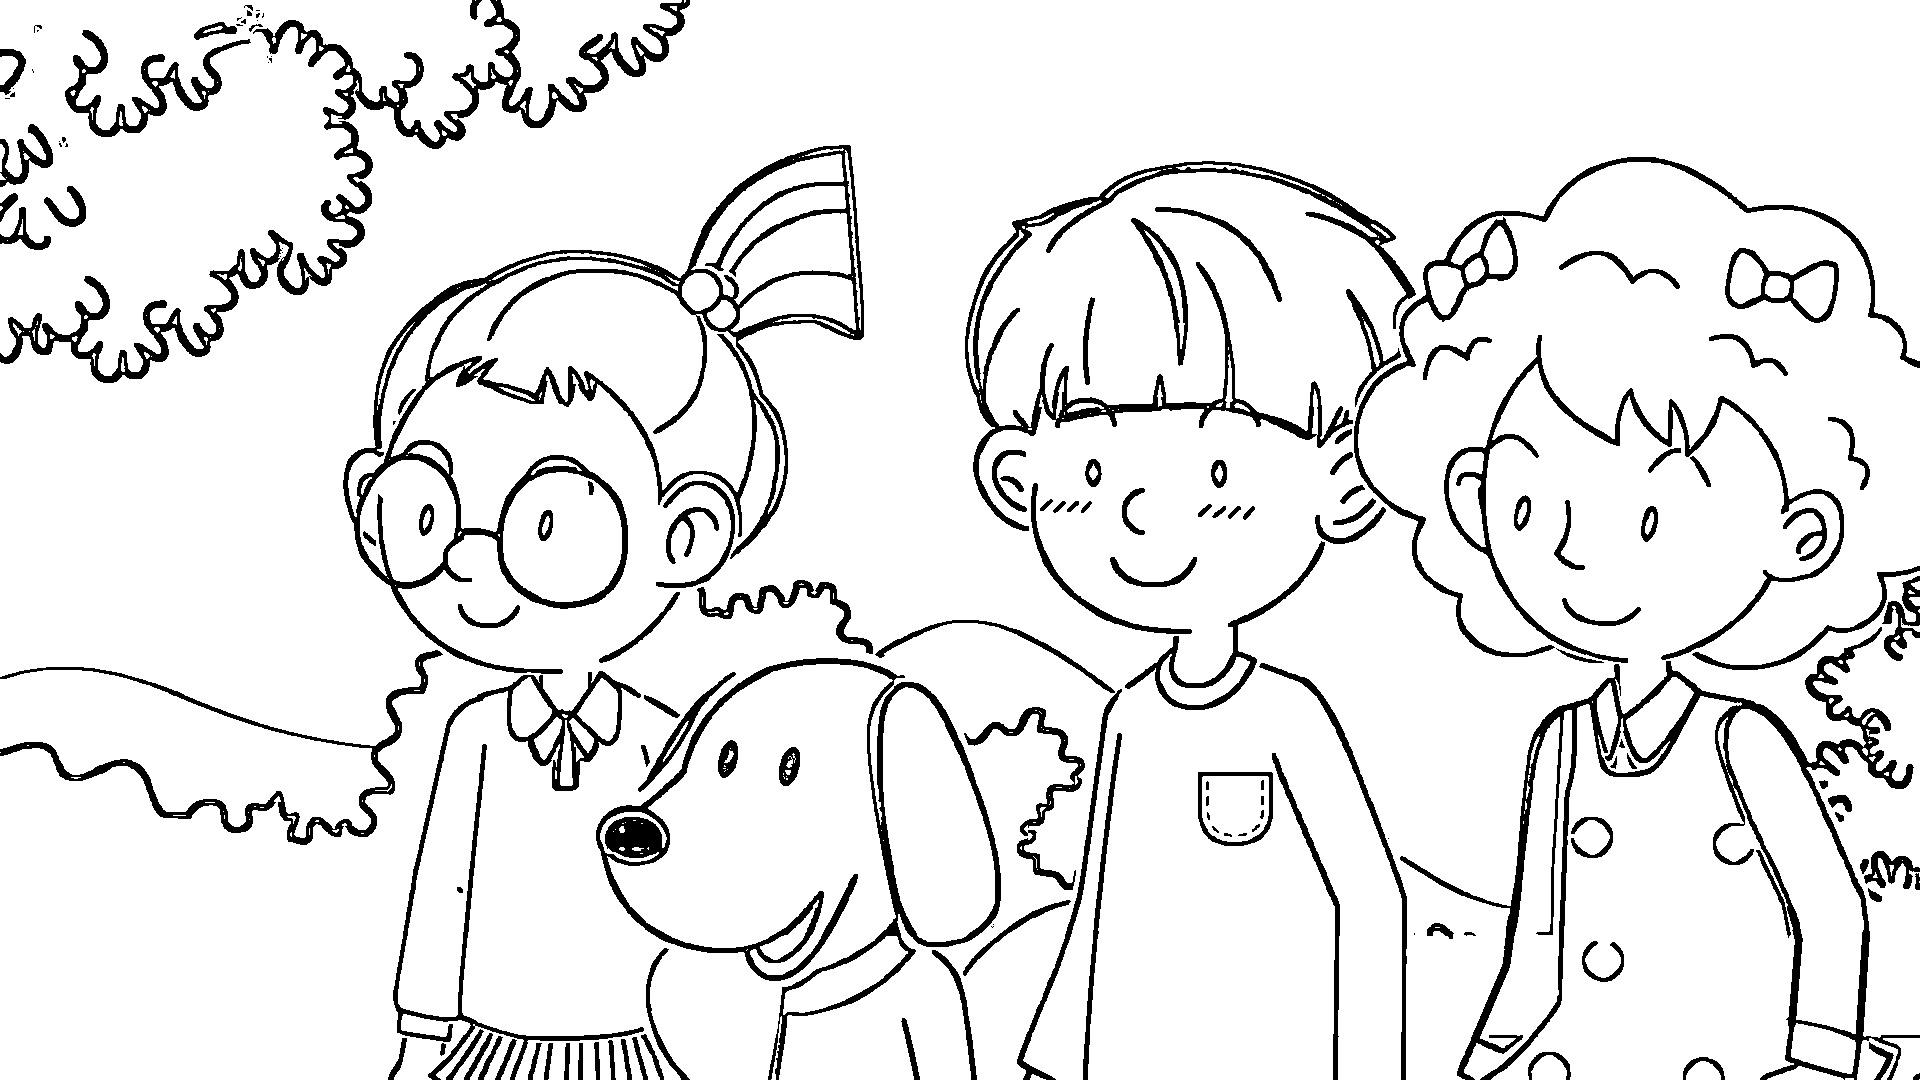 Speaking Cartoon Kids Coloring Page 62